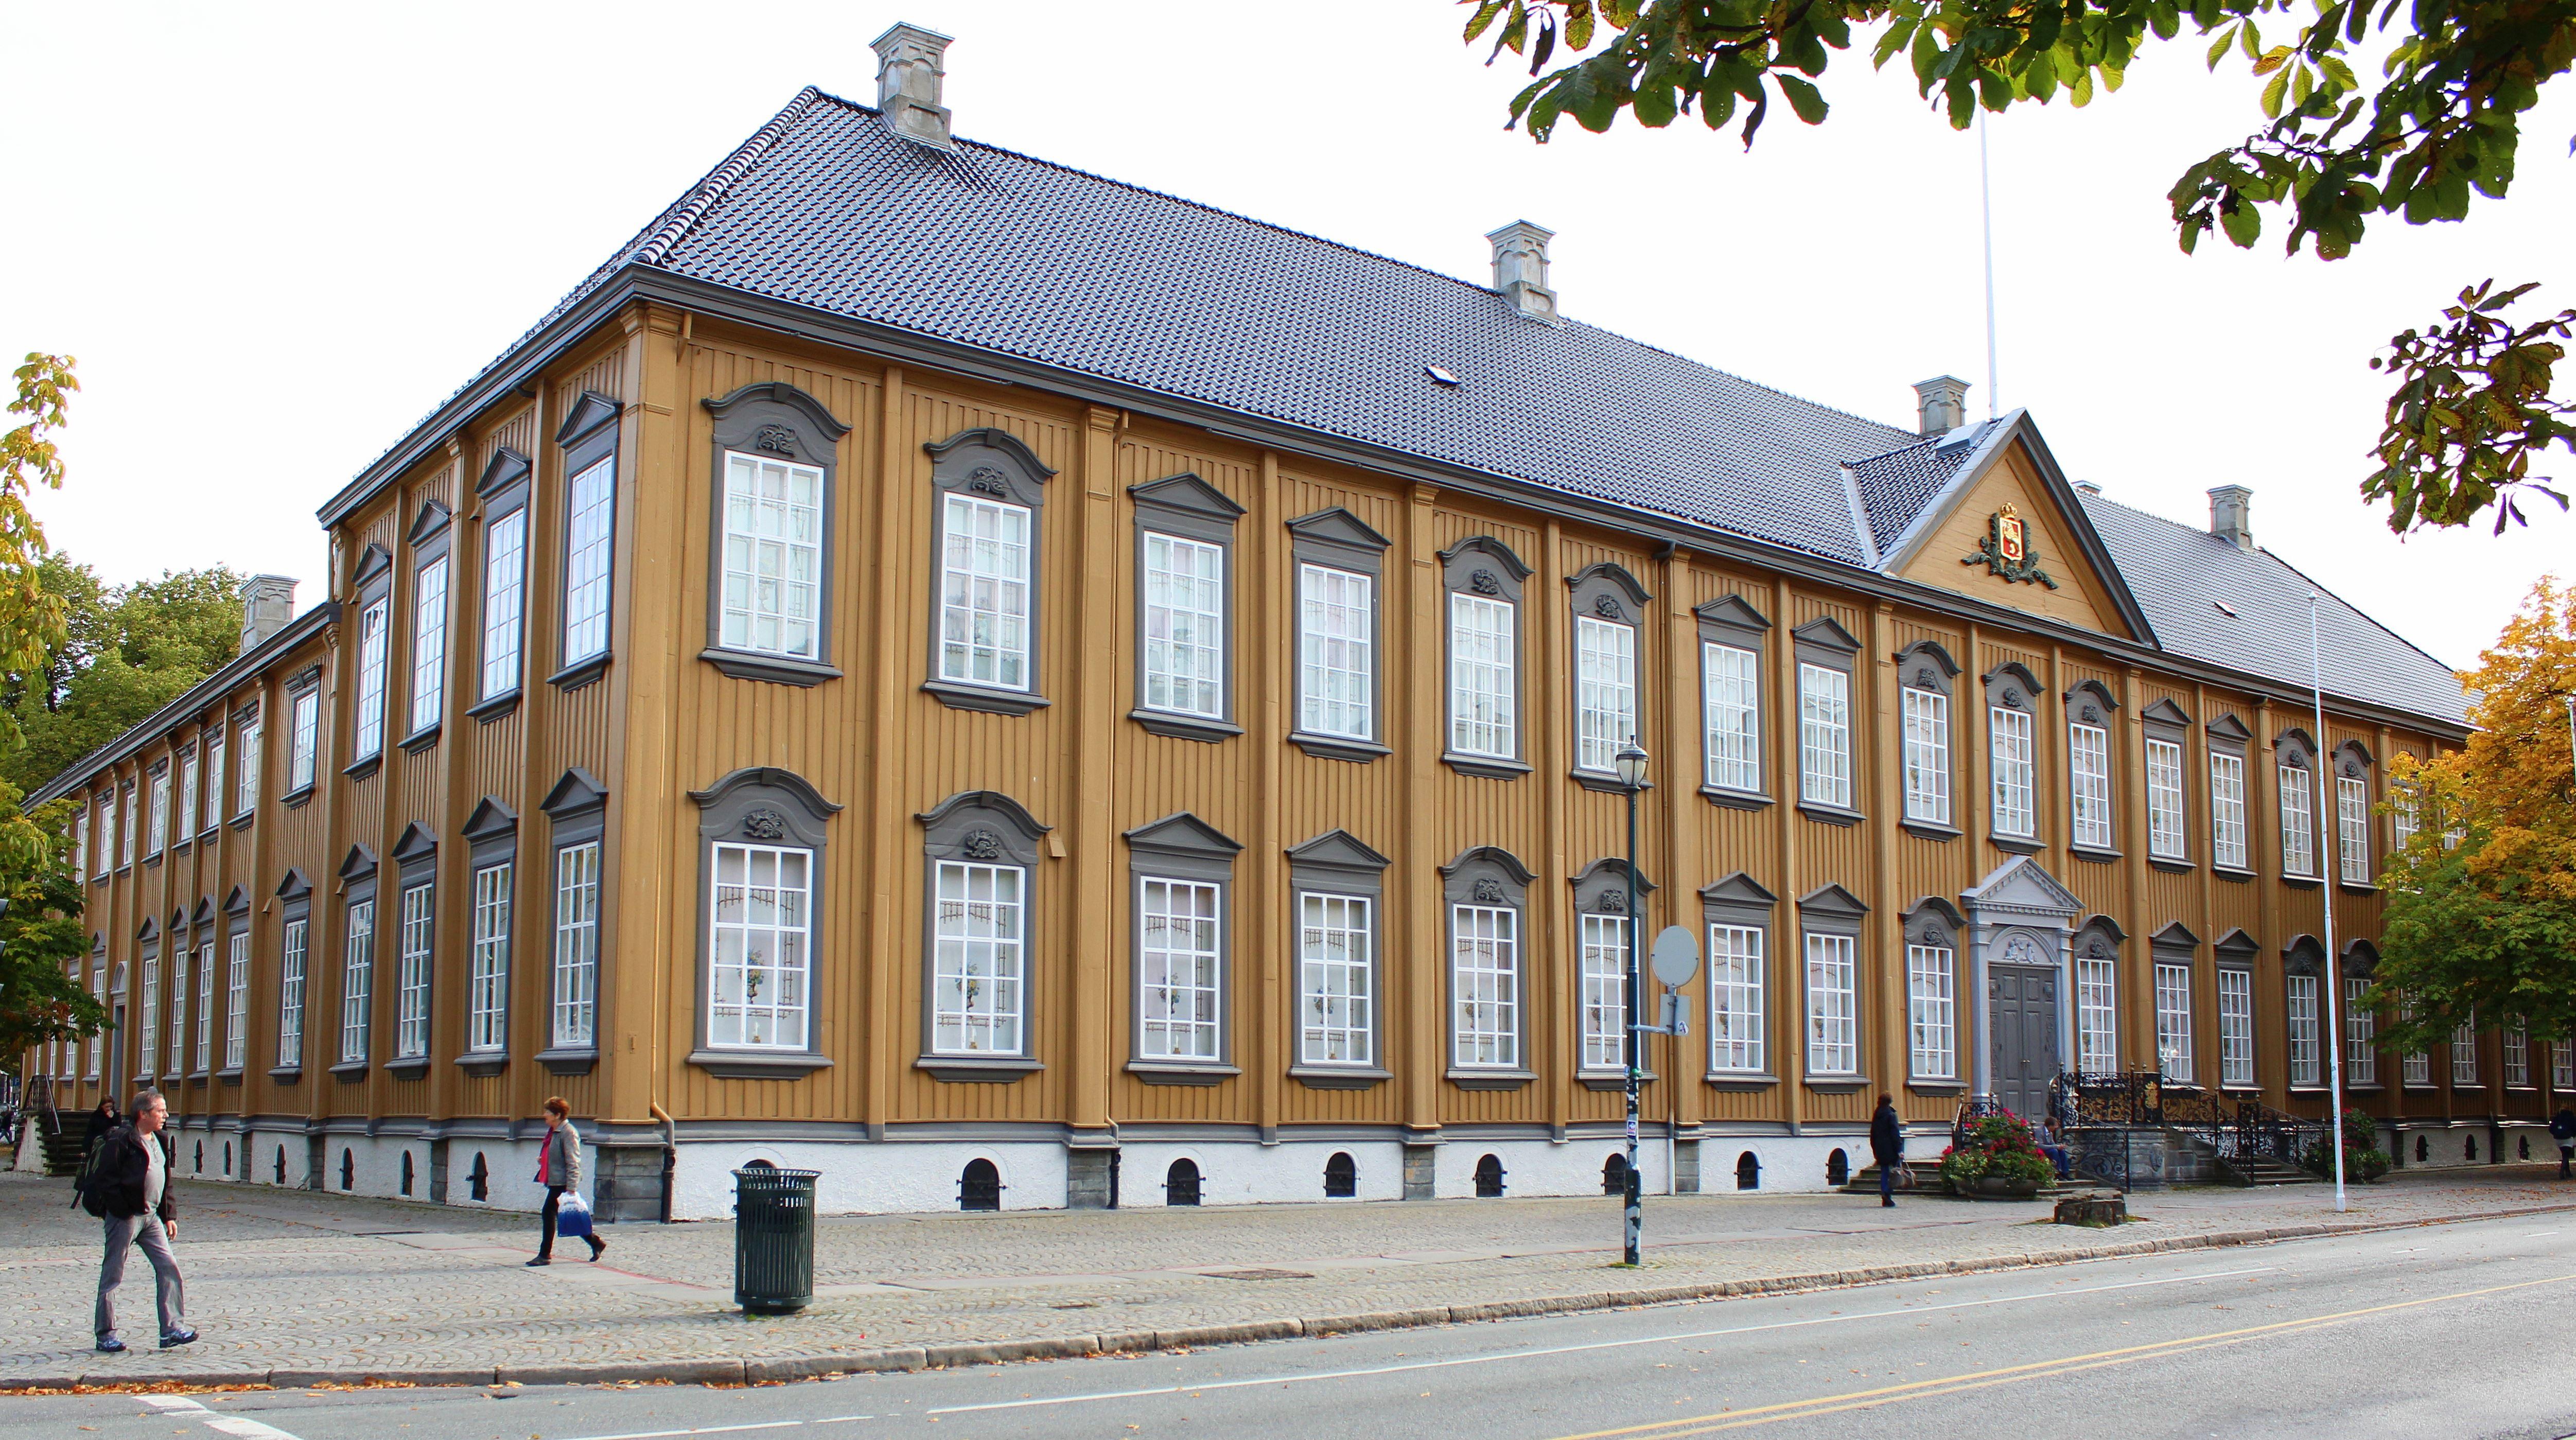 Øyvind Blomstereng, Stiftsgården - The Royal Residence